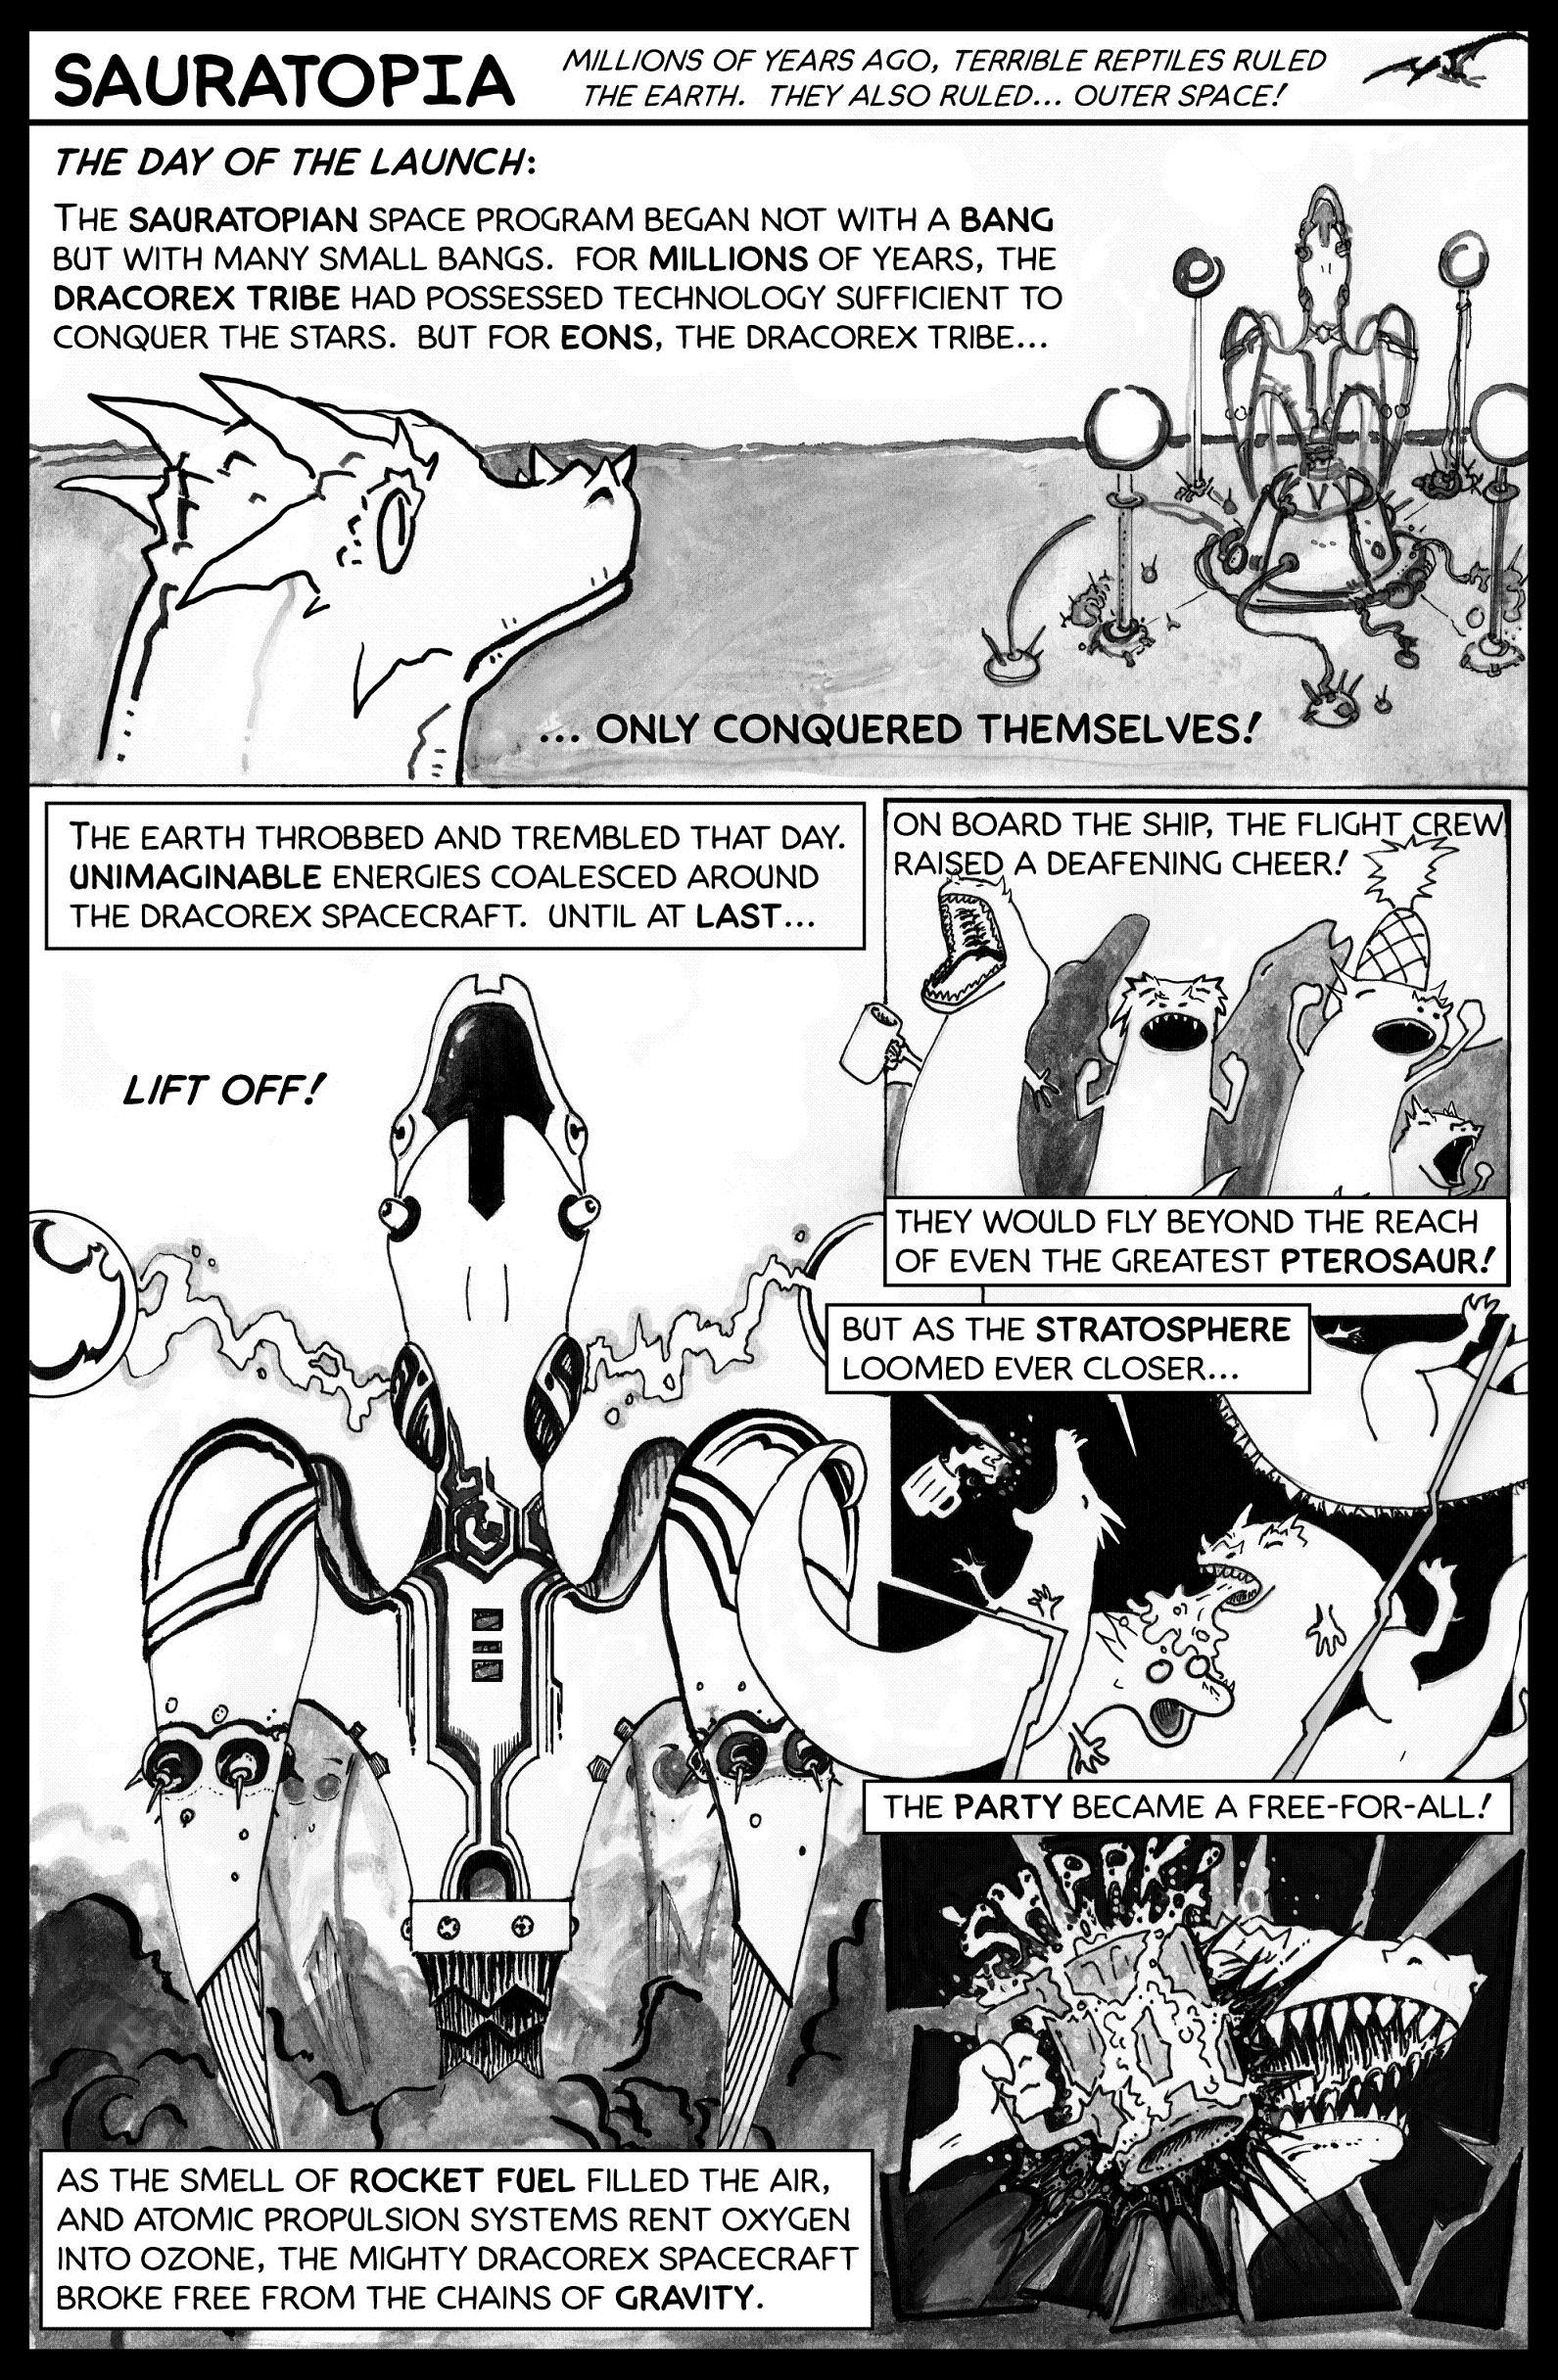 3 Sauratopia pg 1